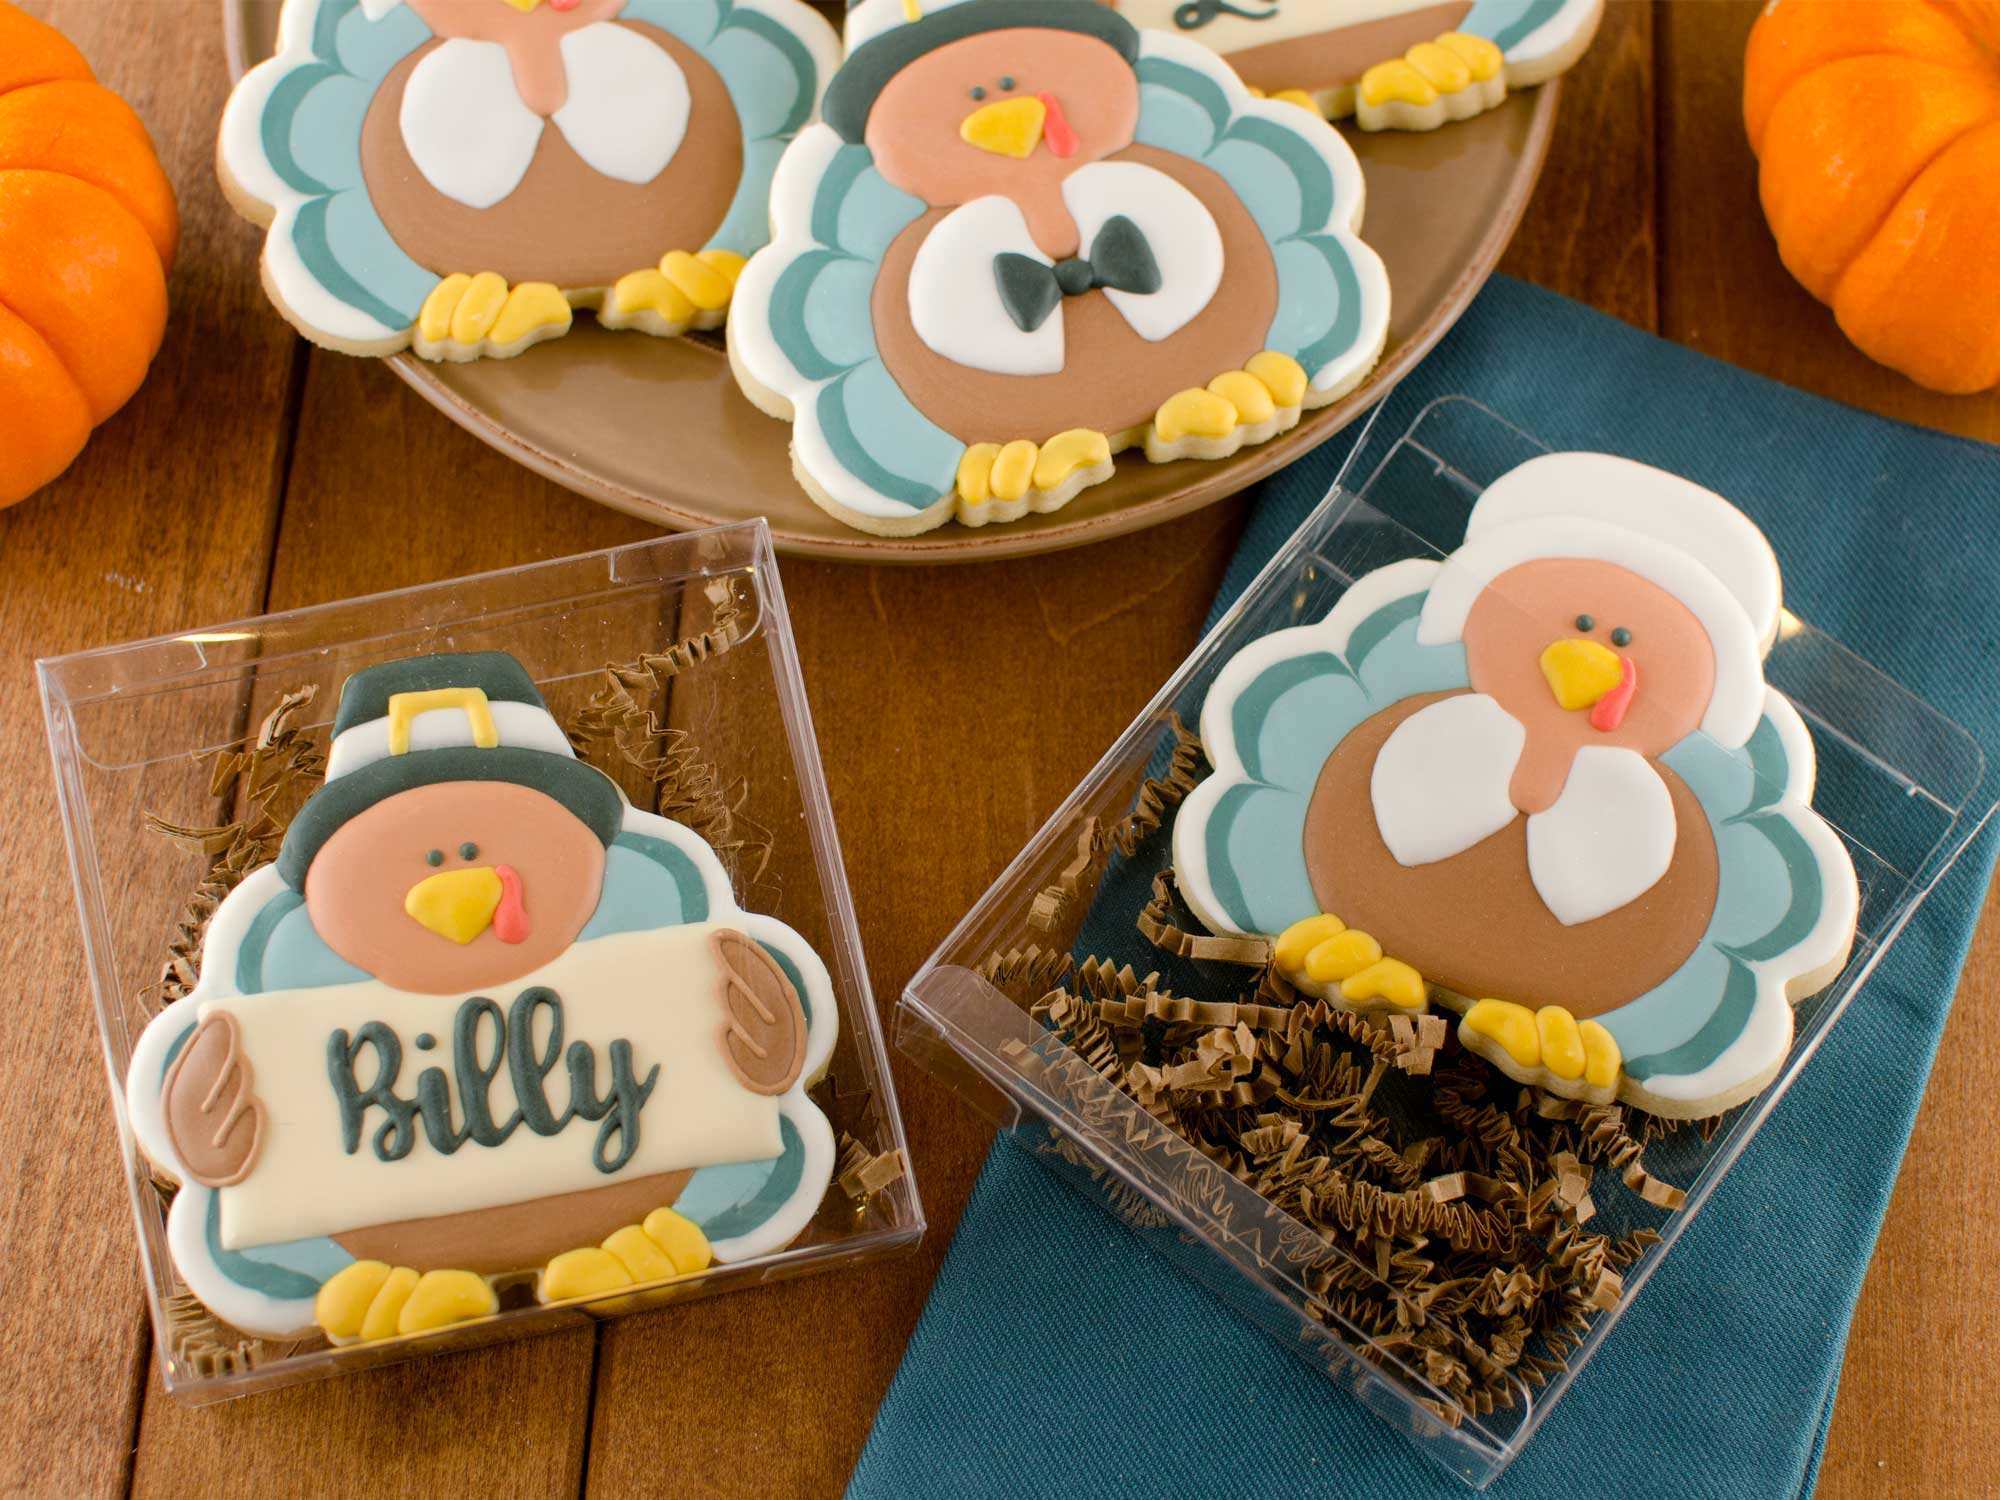 pilgrim turkey cookies in gift box